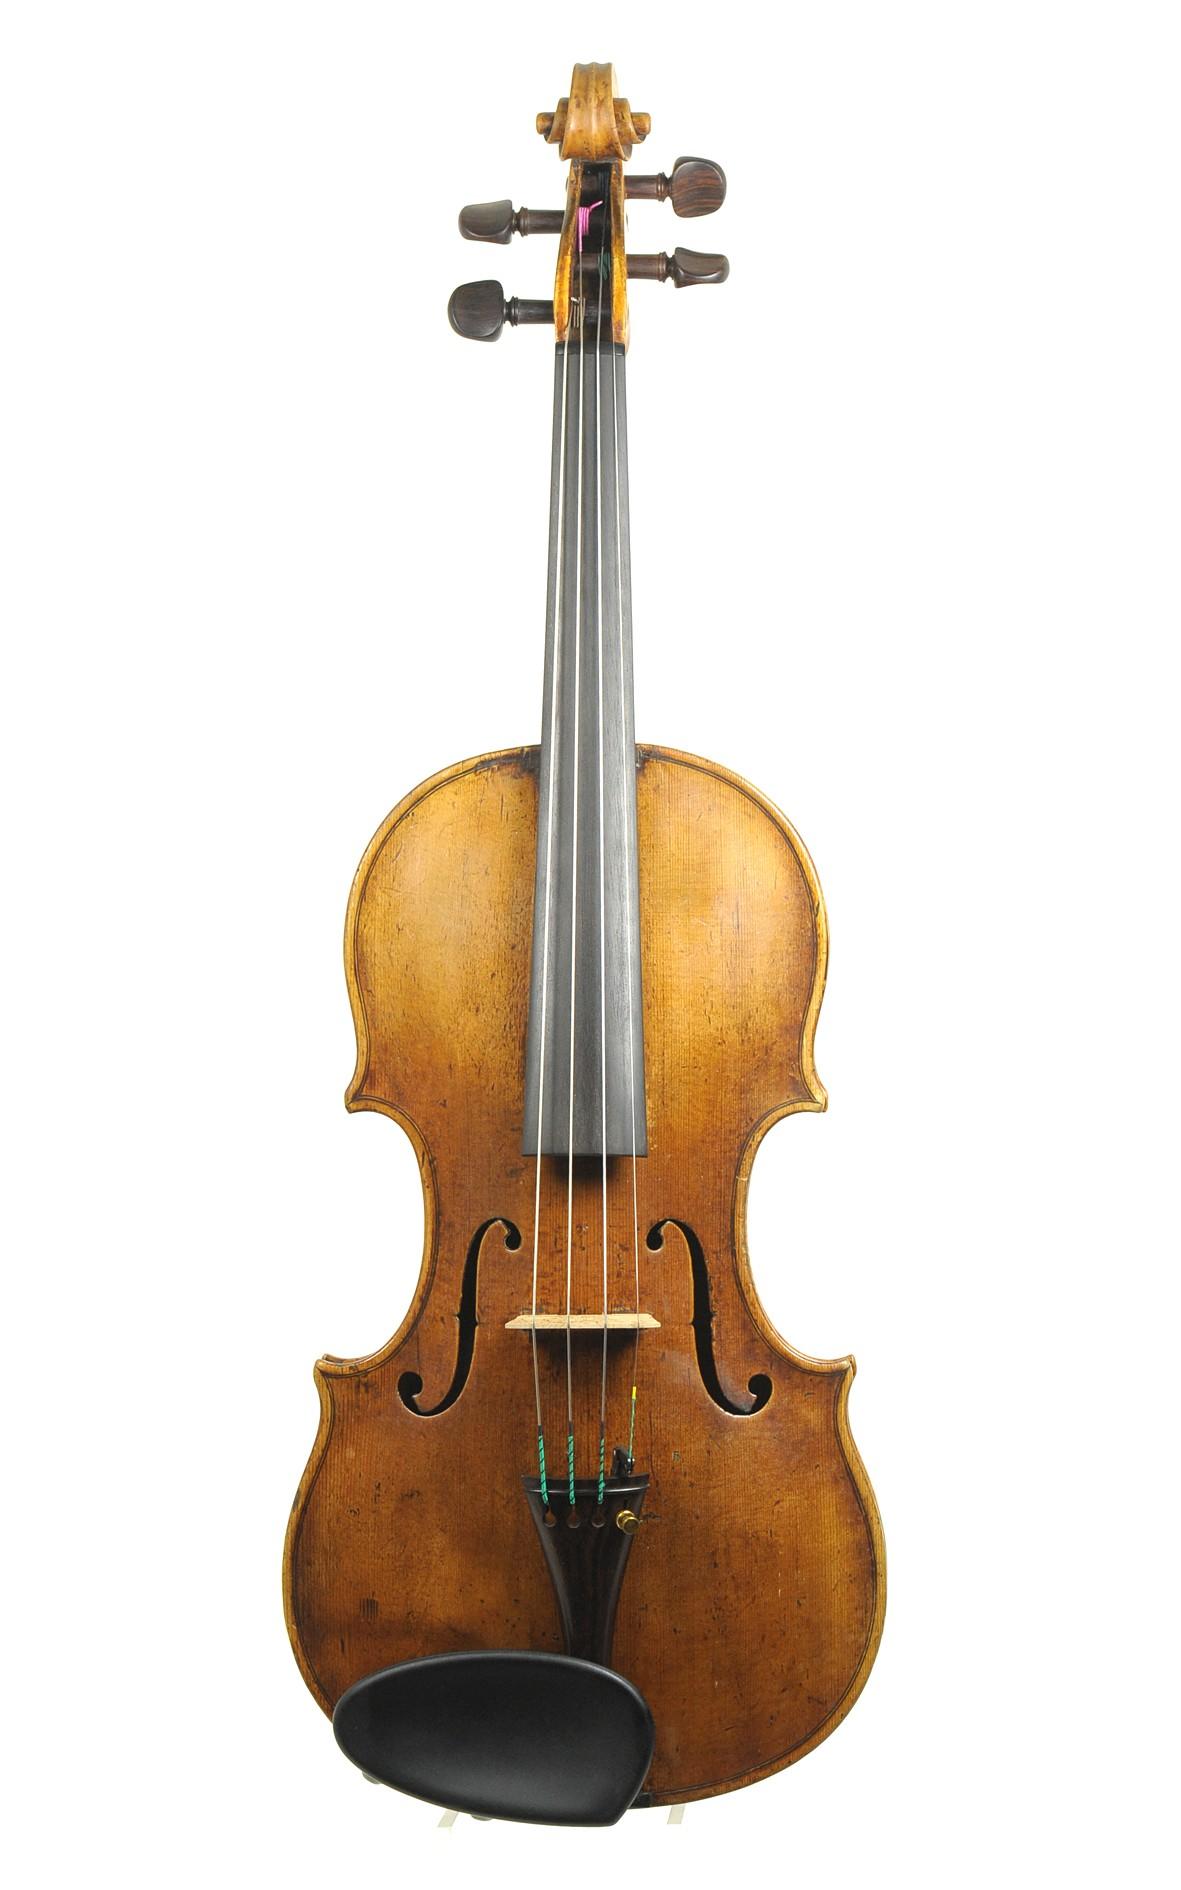 Georg Klotz circa 1790: fine violin from the Yehudi Menuhin collection